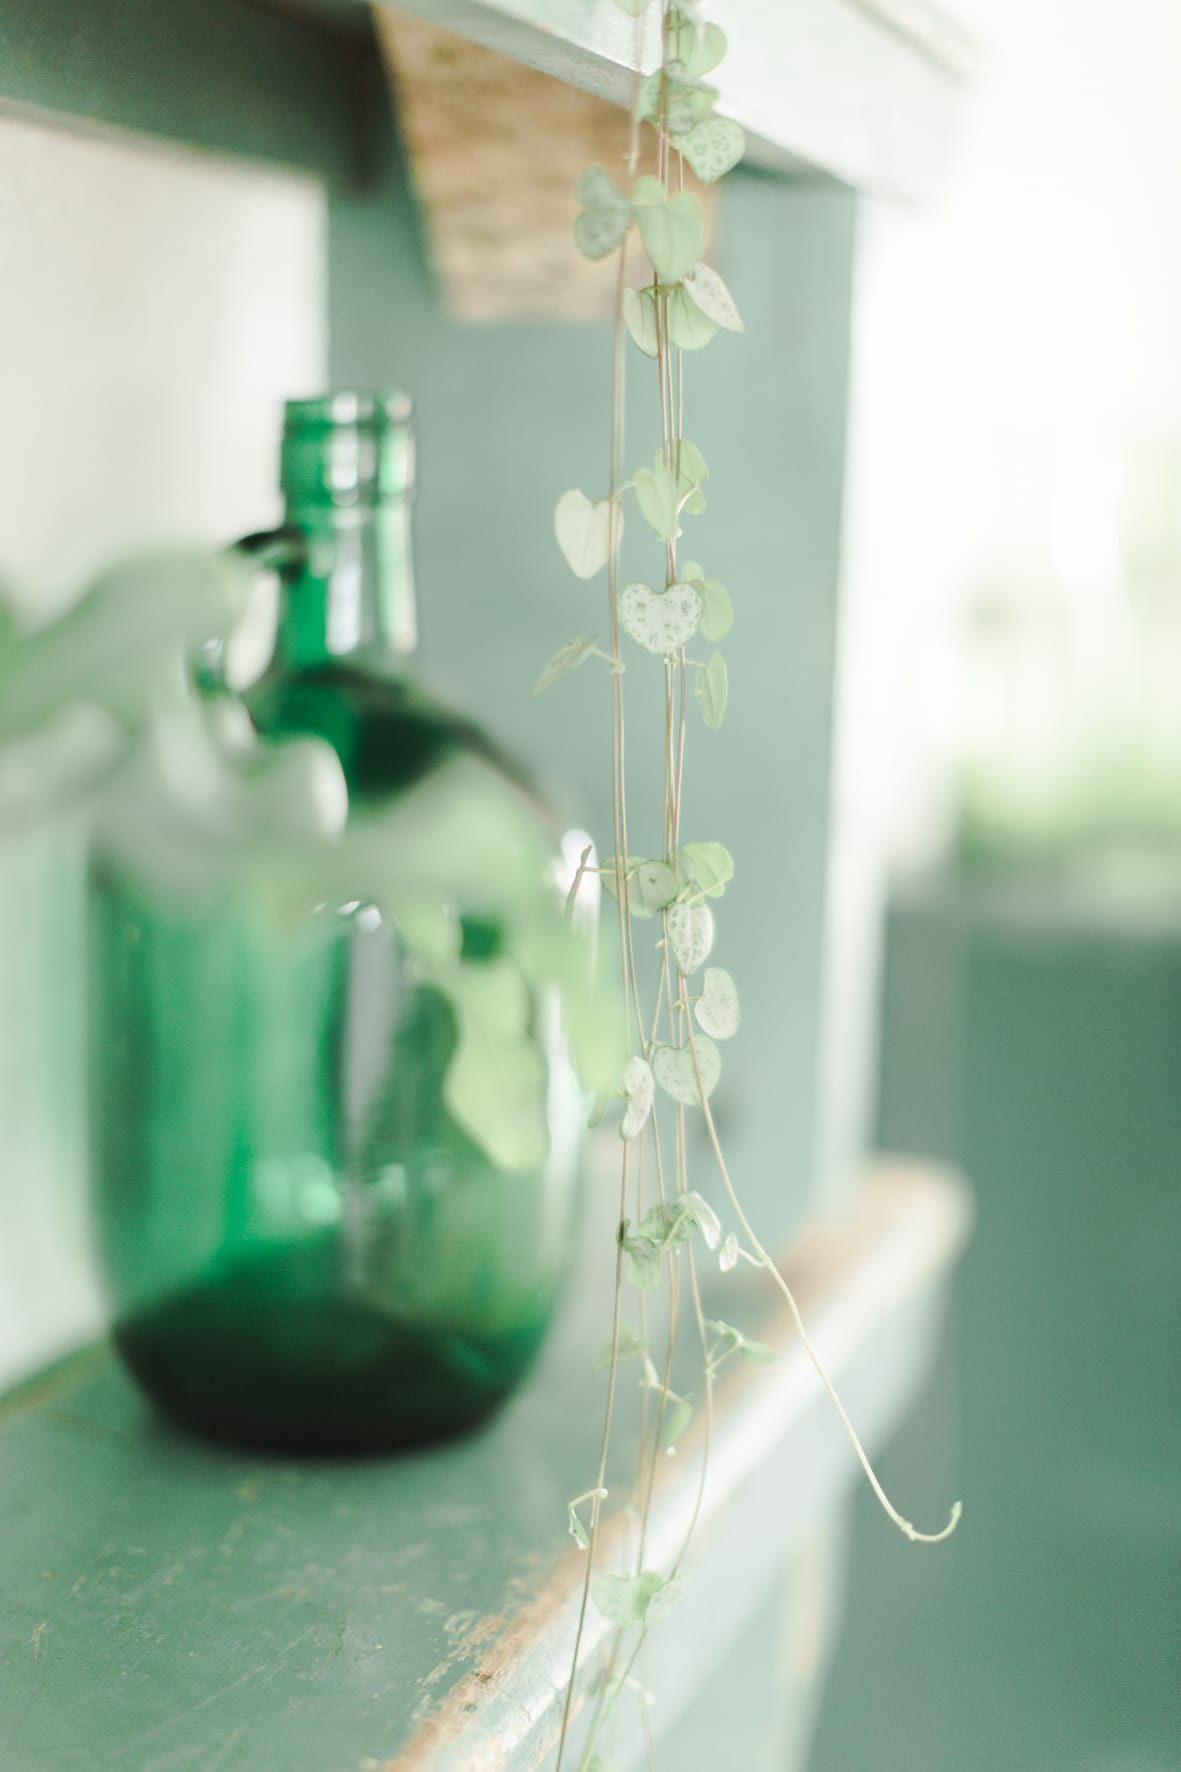 obonheurdesdames-location-decoration-mobilier-jerometarakci-mariage-angers-nantes-066032